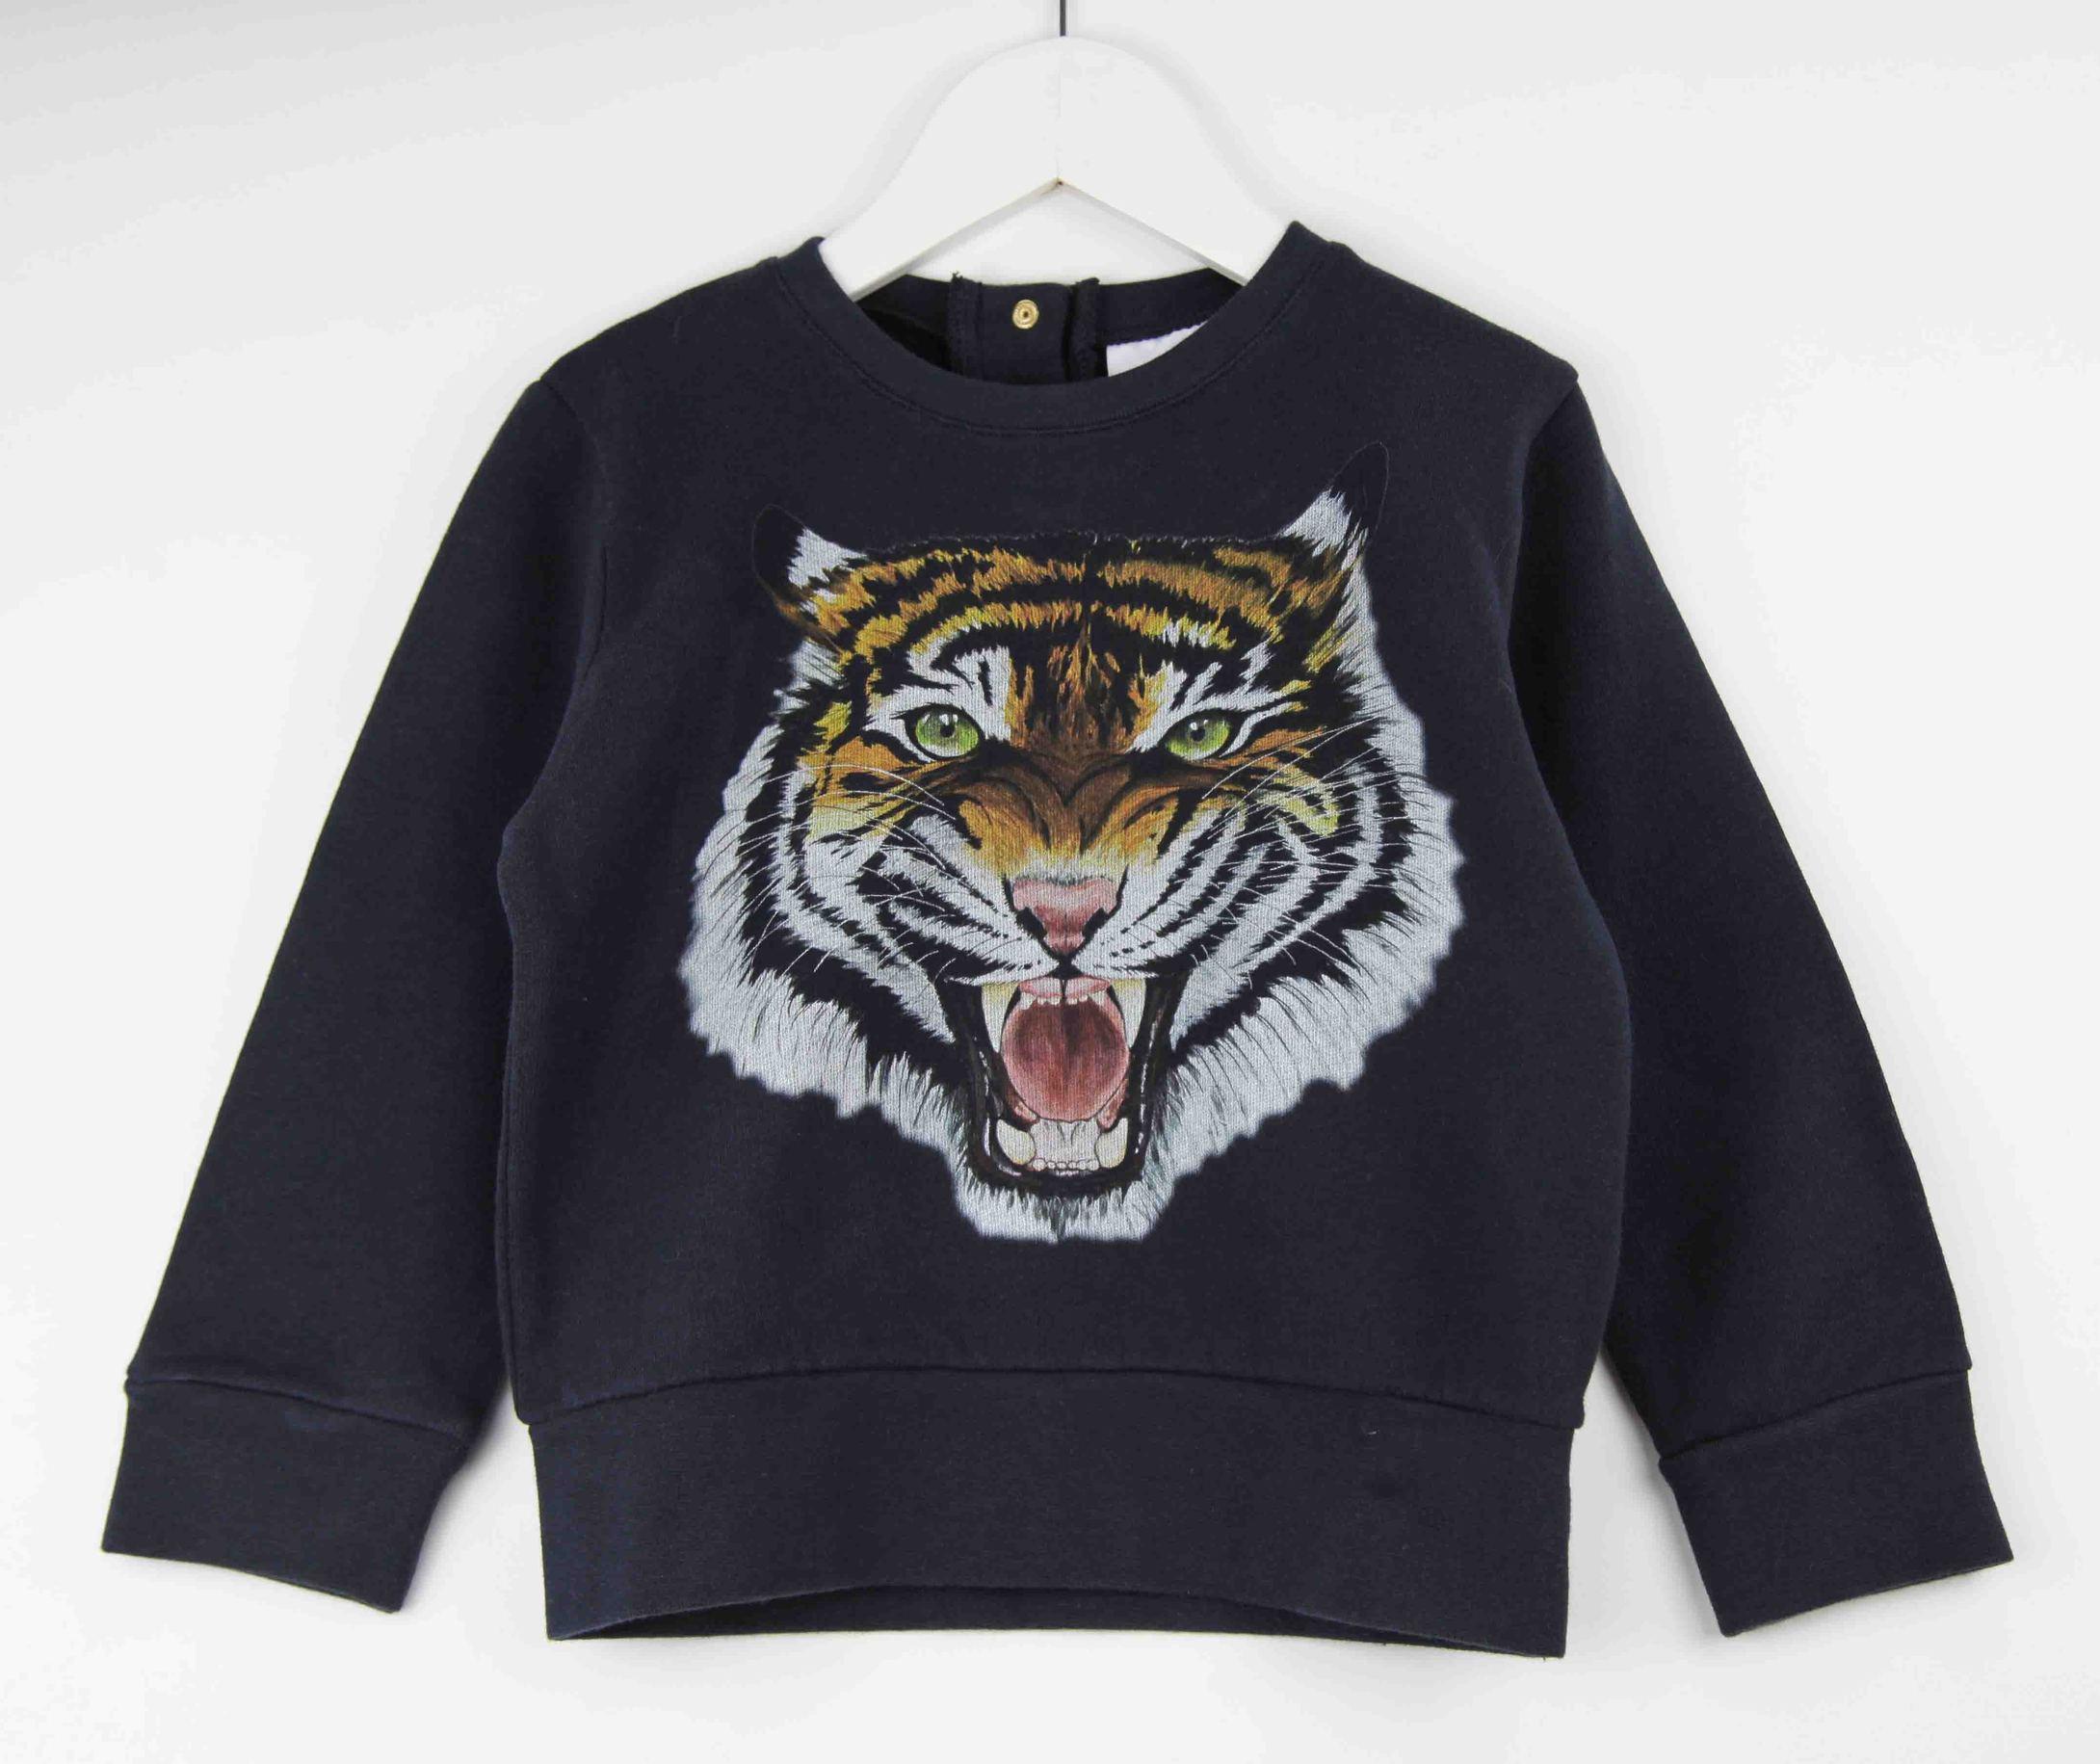 kids-tiger-sweatshirt